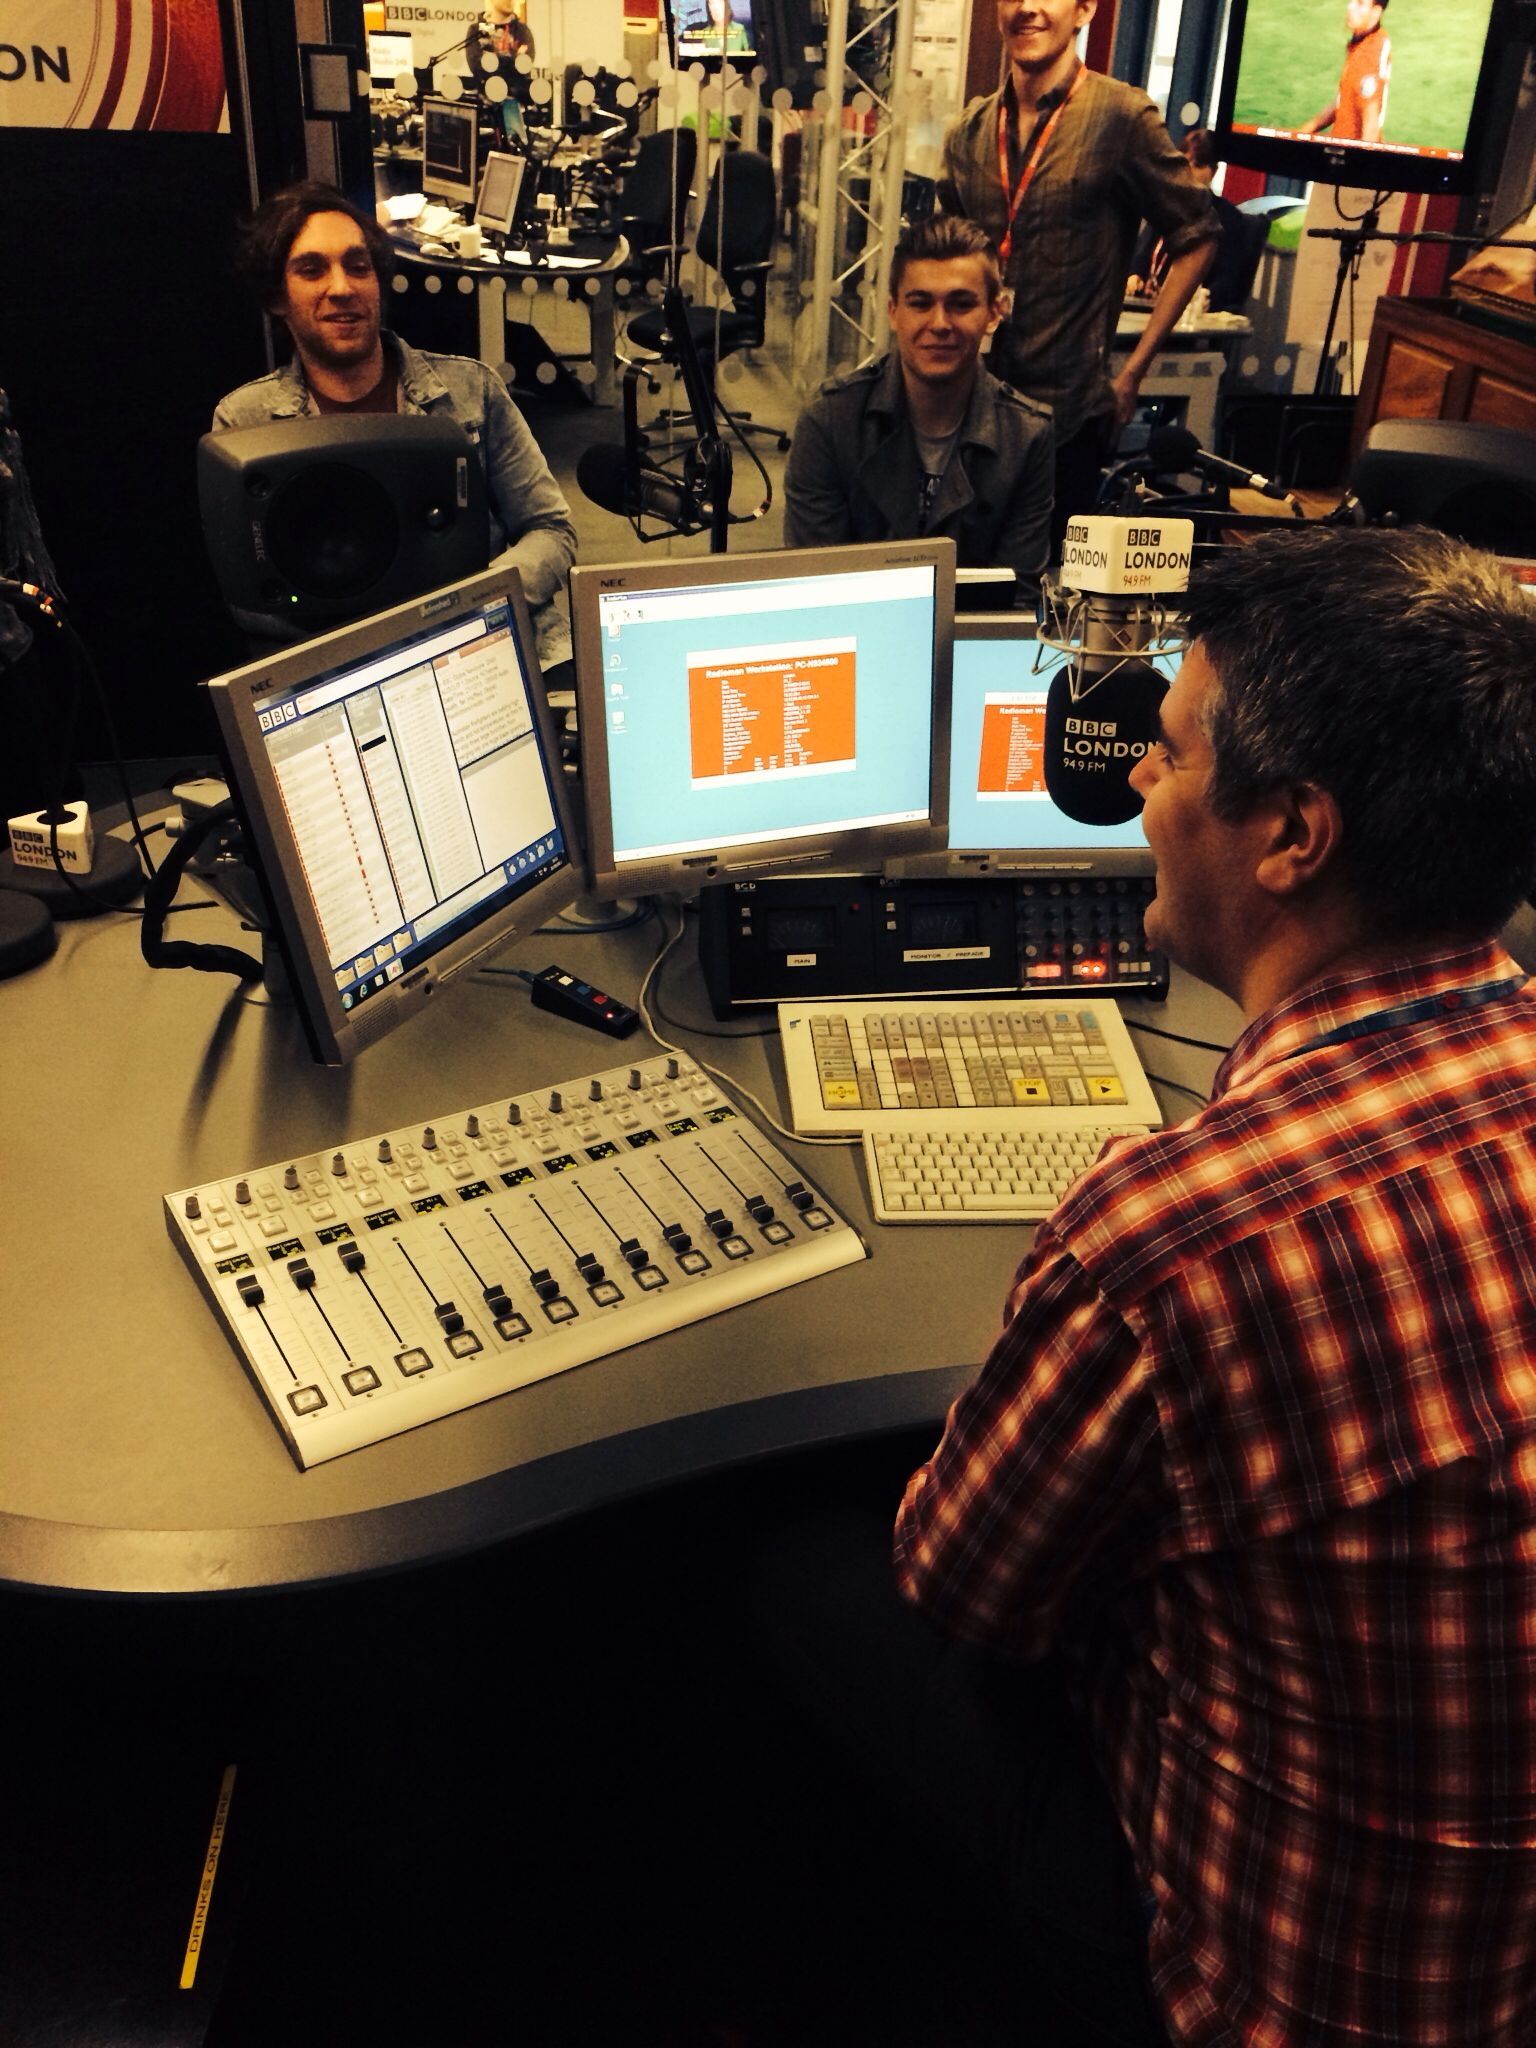 Live in studio with BBC Radio London Bbc radio, Radio